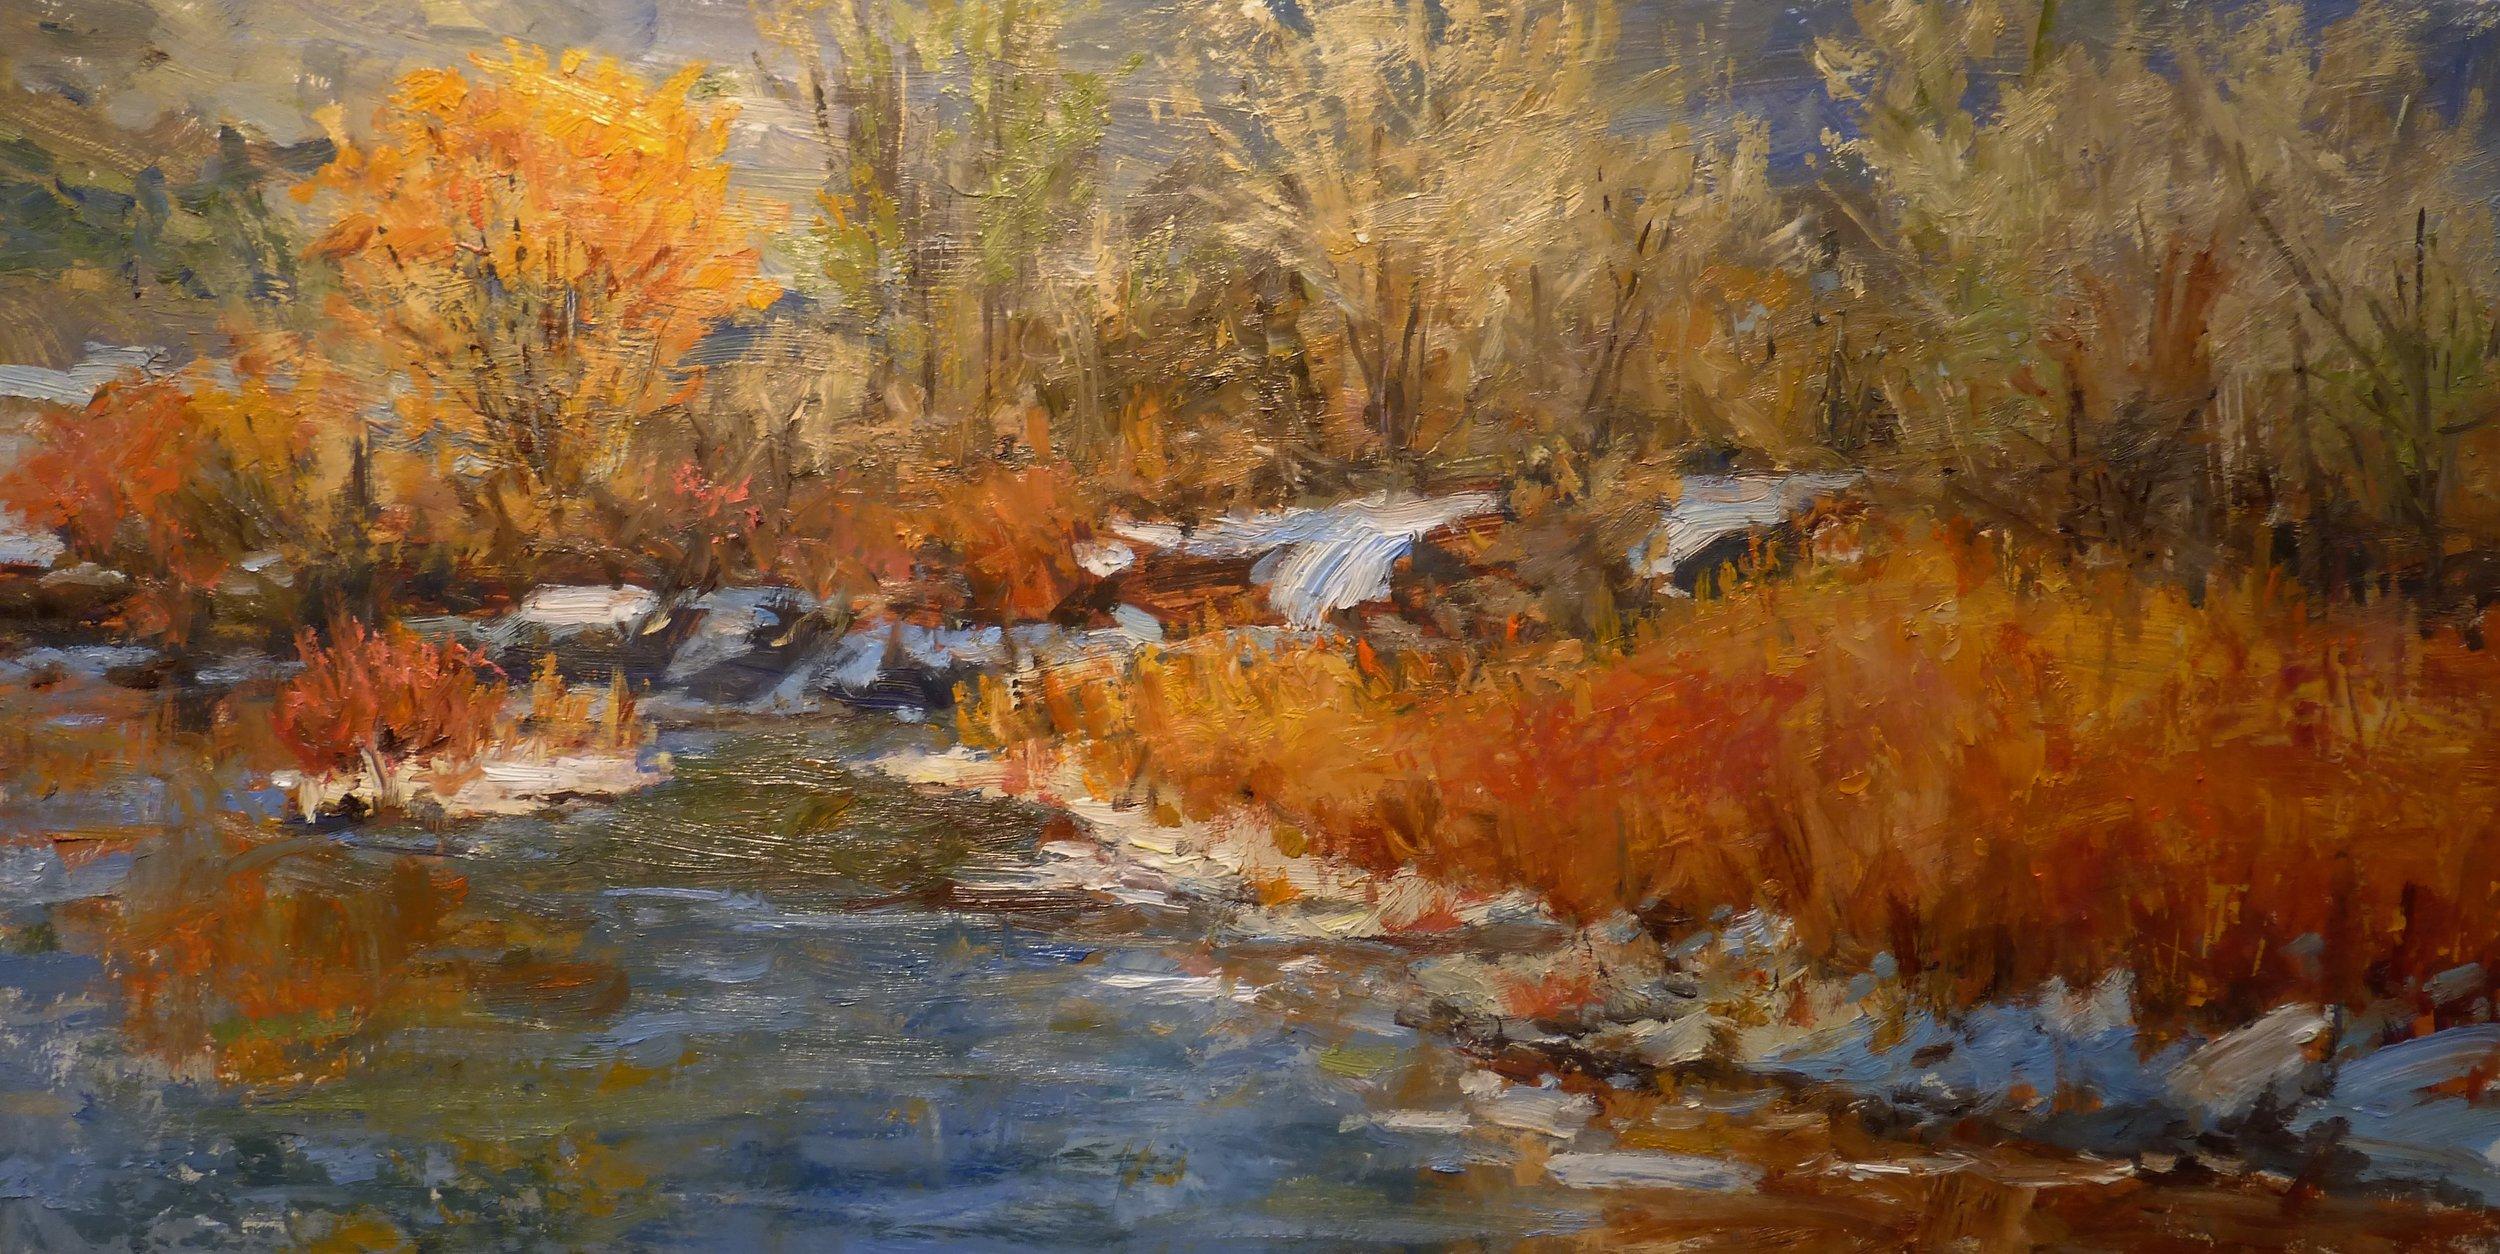 Winter Willows  12 x 24  Oil on Panel